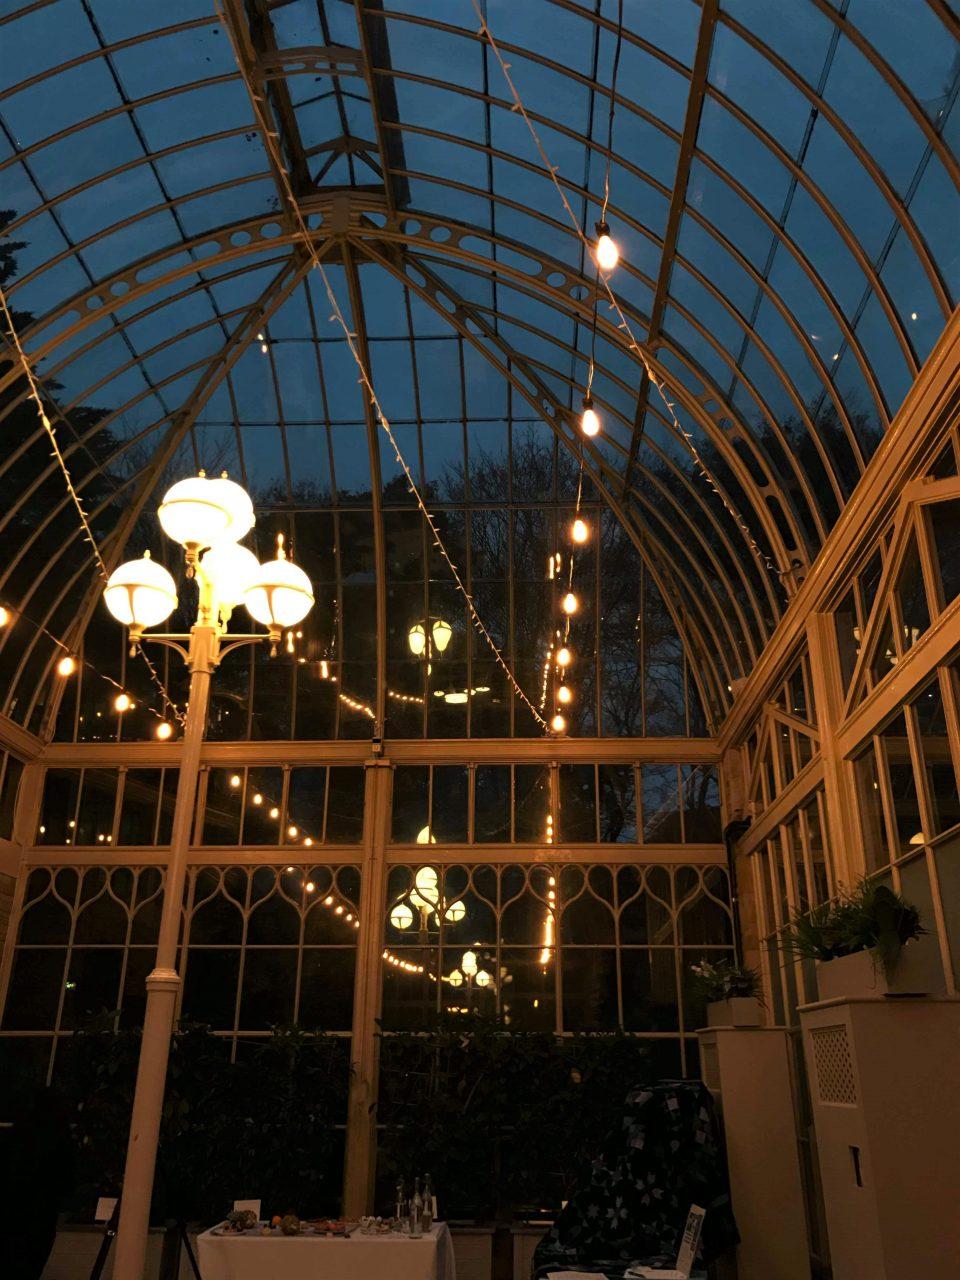 the orangery at night